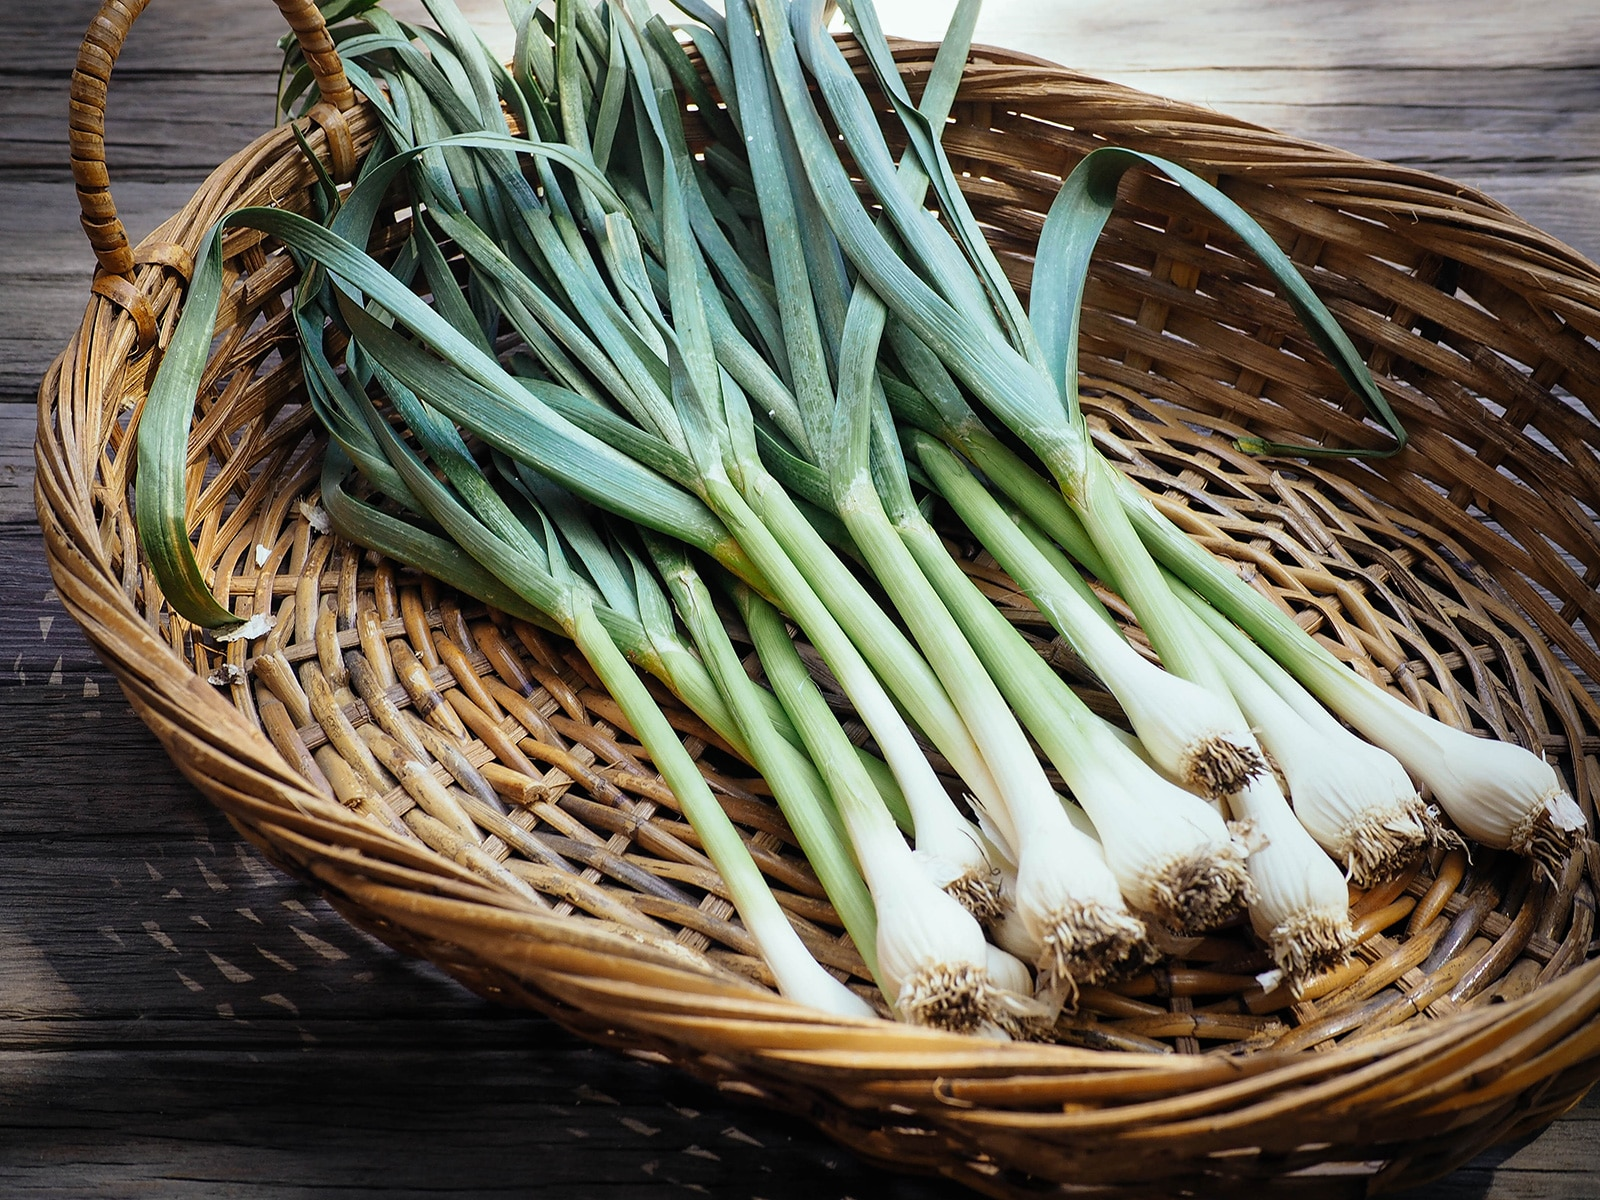 Basket of homegrown spring garlic, also called green garlic